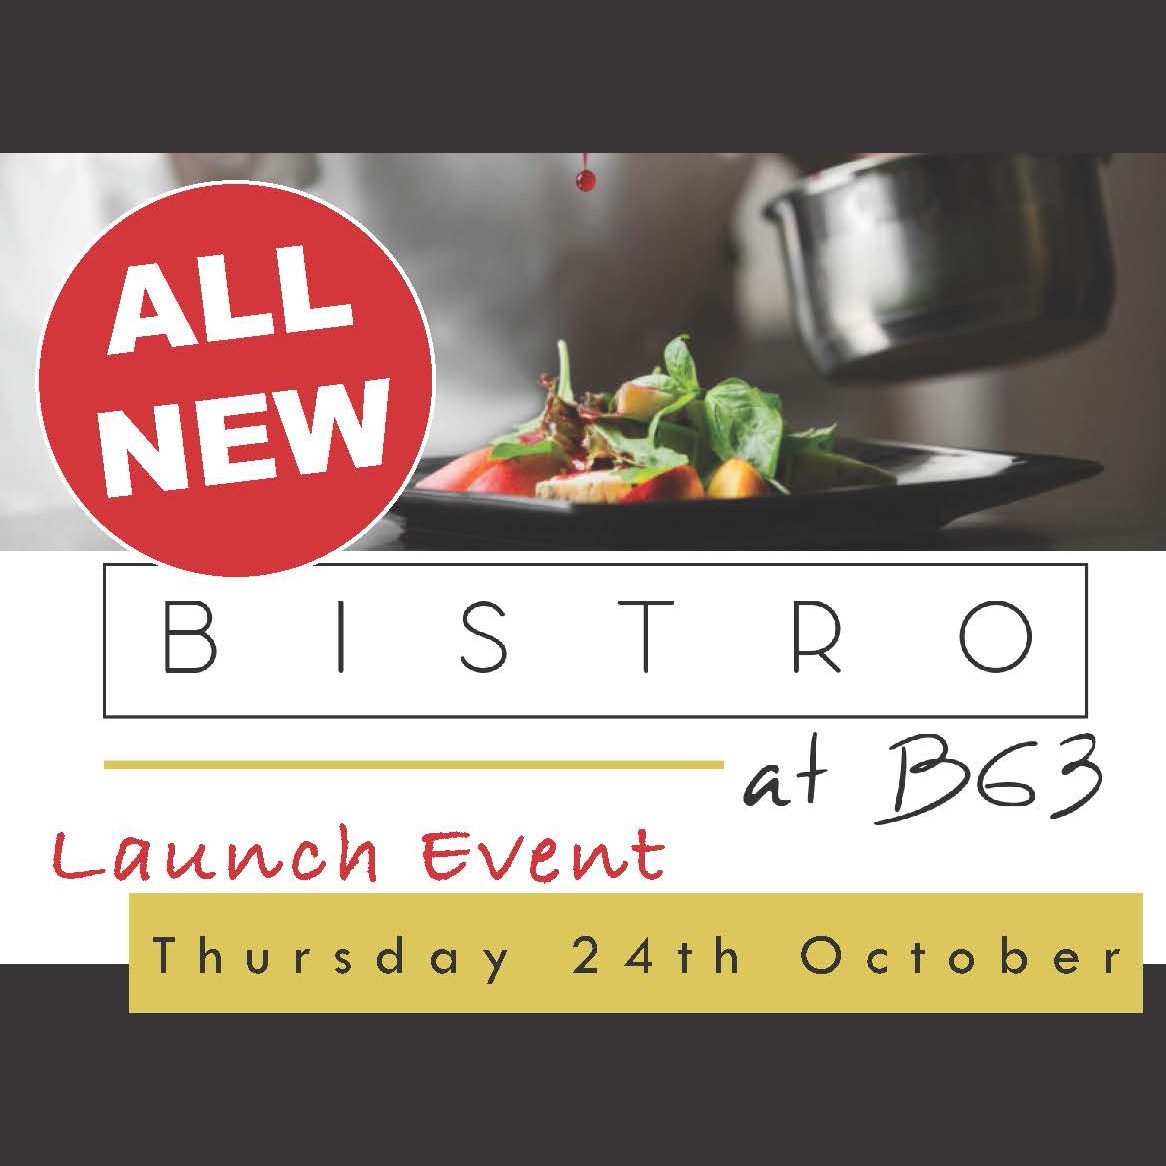 Bistro Launch Event